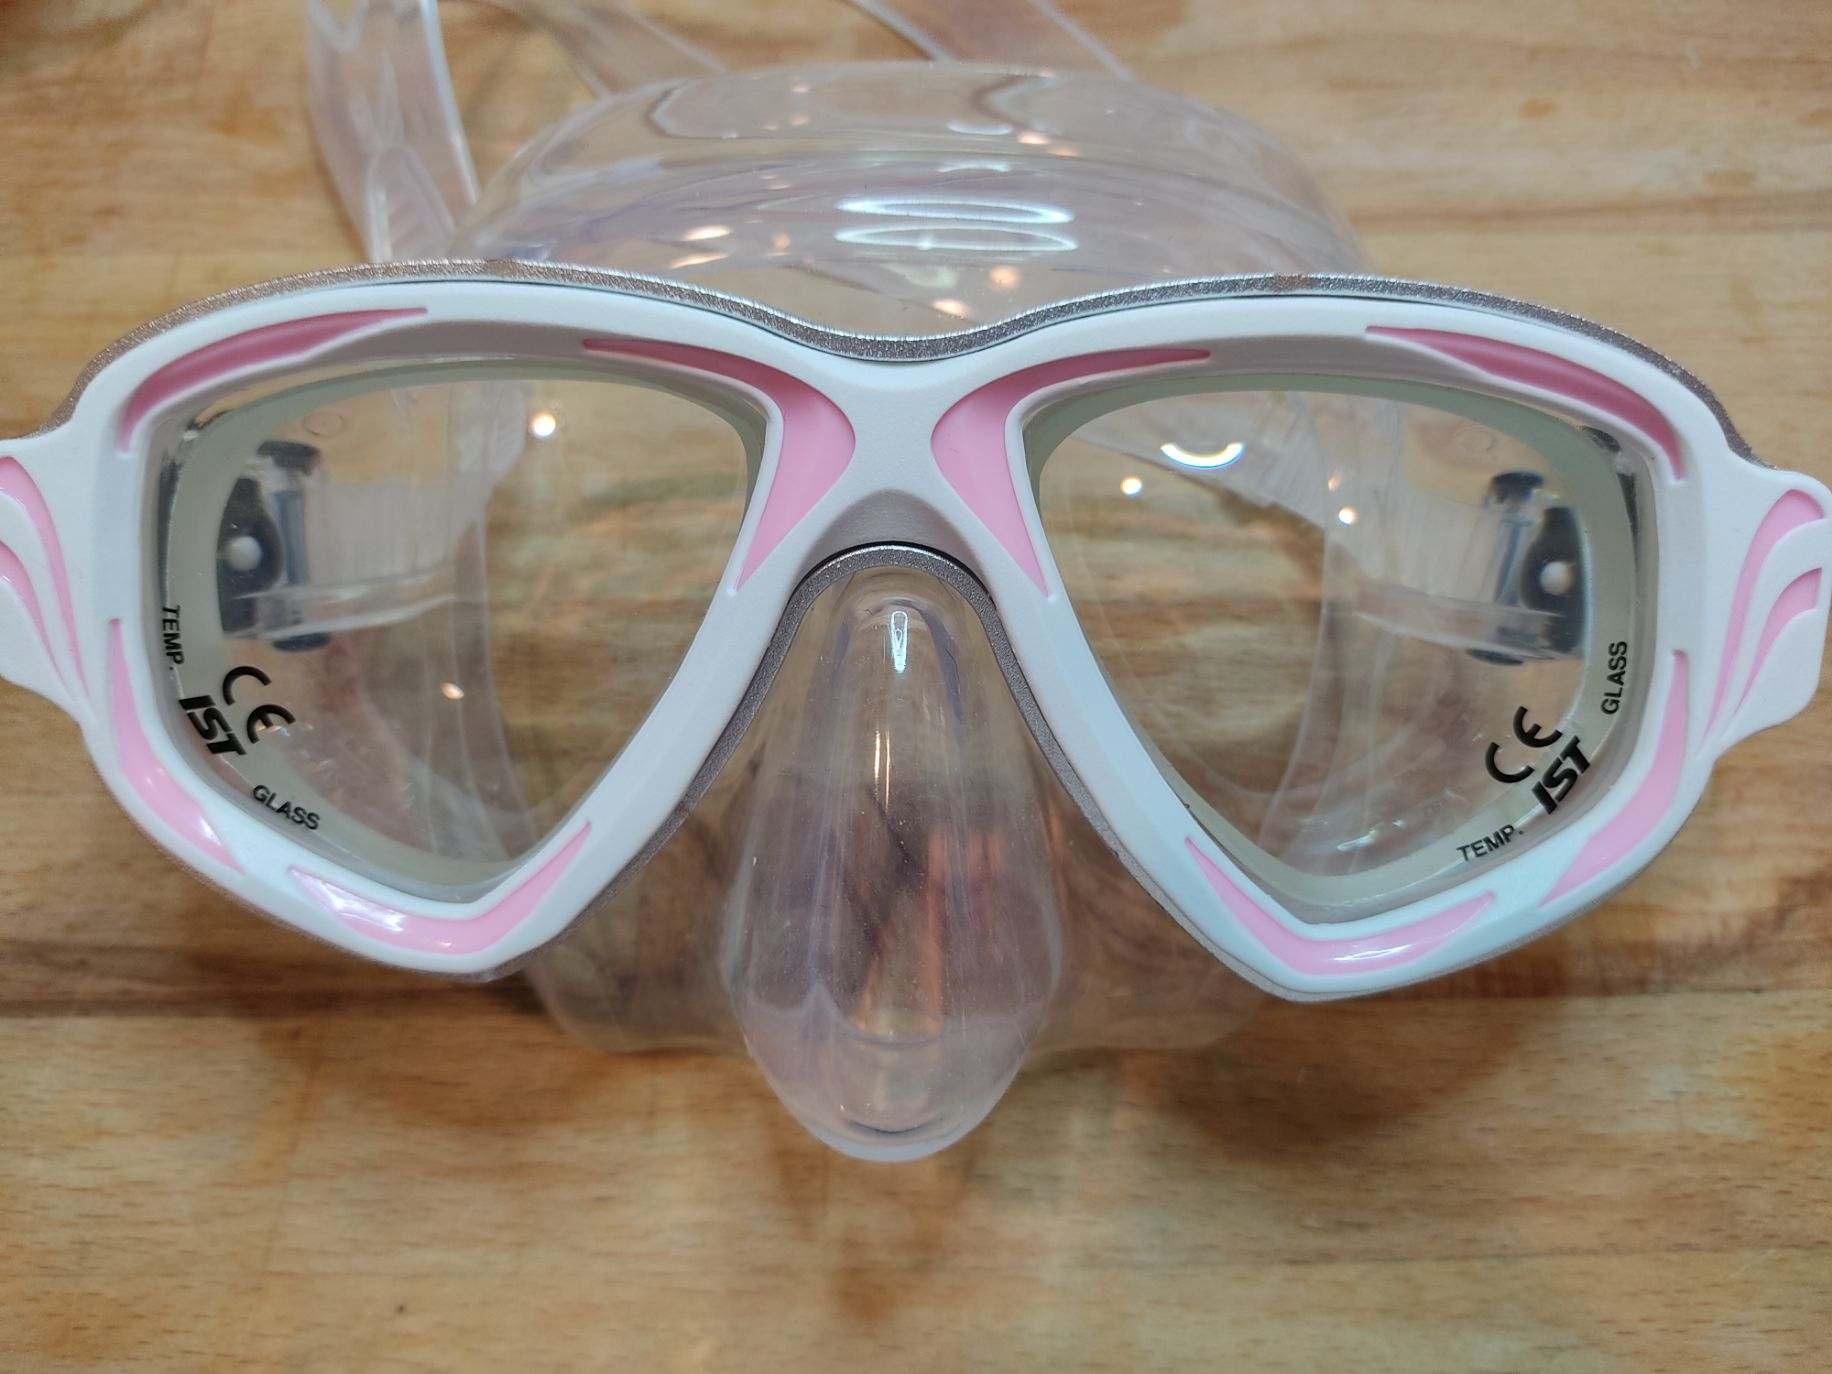 Scuba diving mask with light pink frame and higher strength prescription lenses.